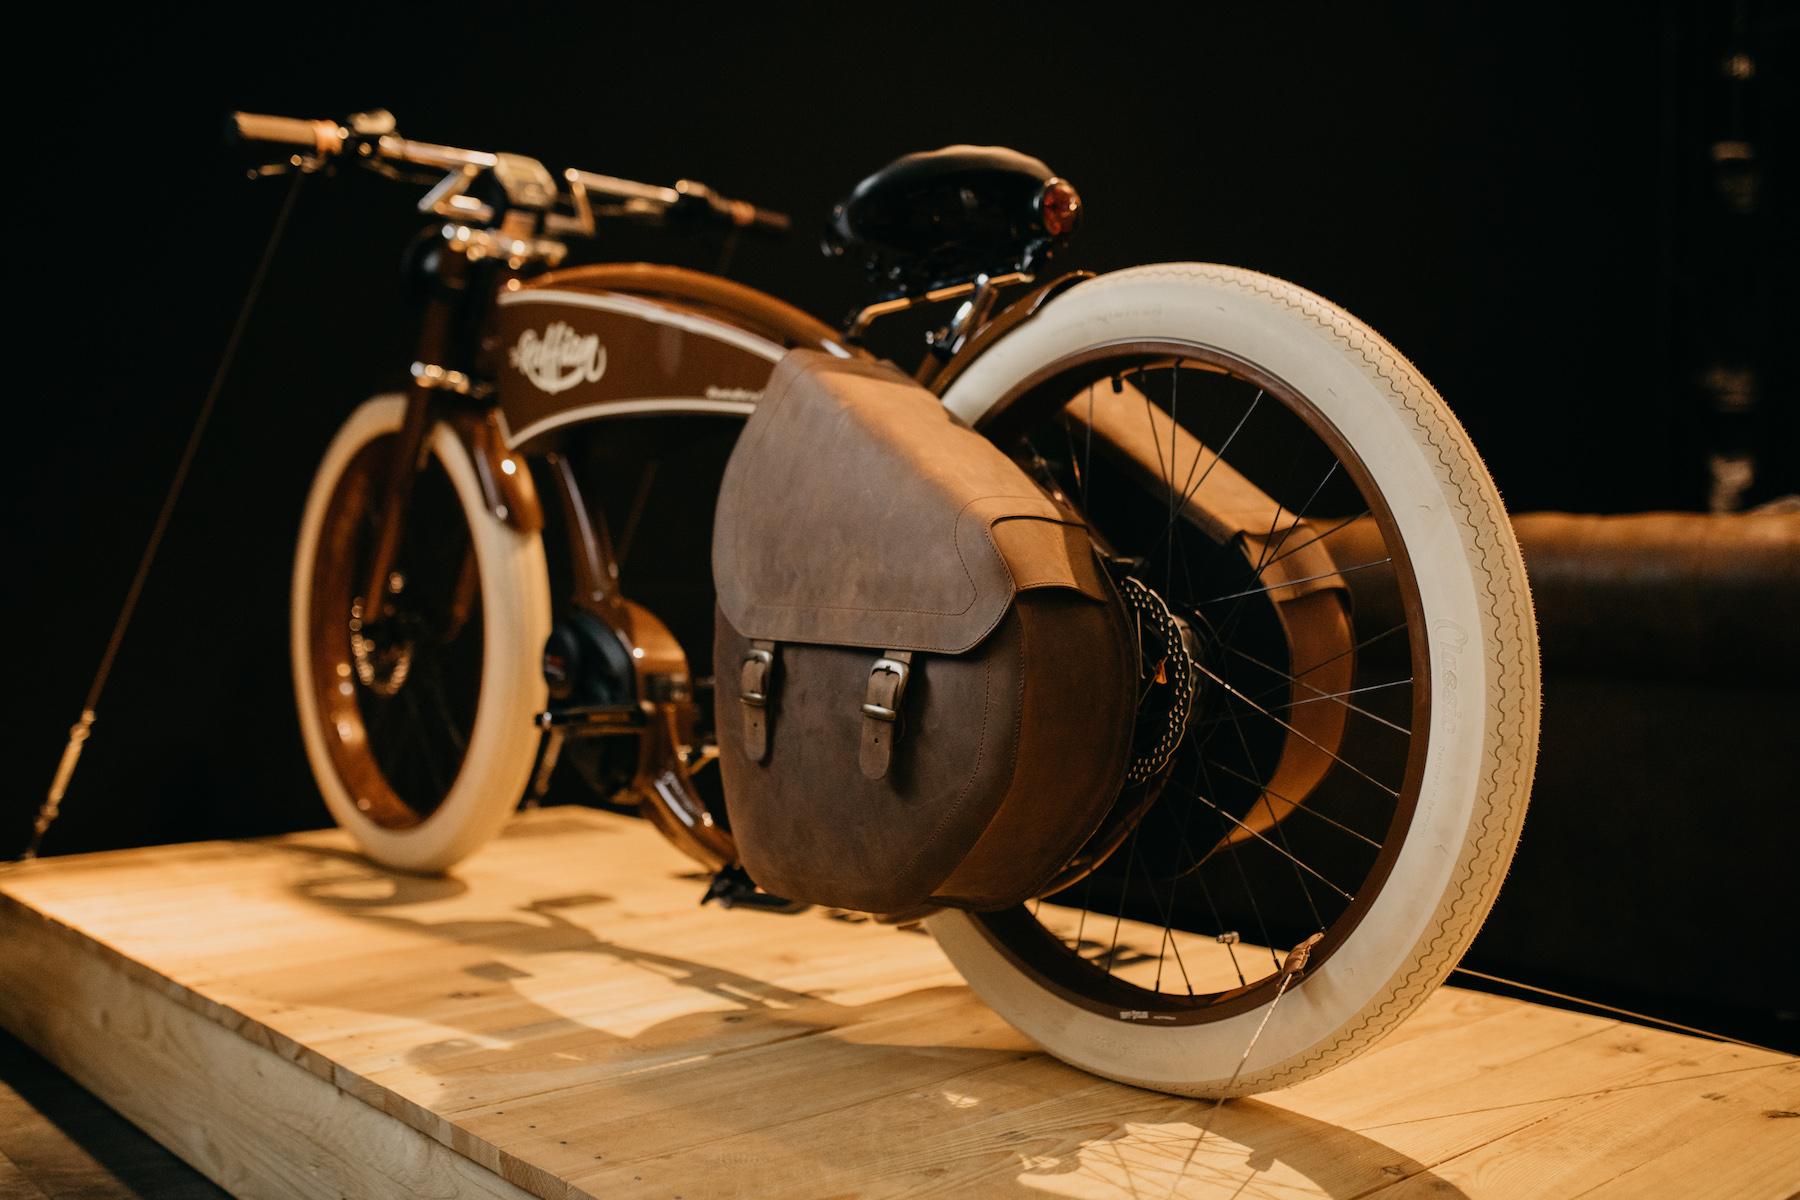 Ruff Cycles - Ruffian Brown, mit handgemachten Ledertaschen